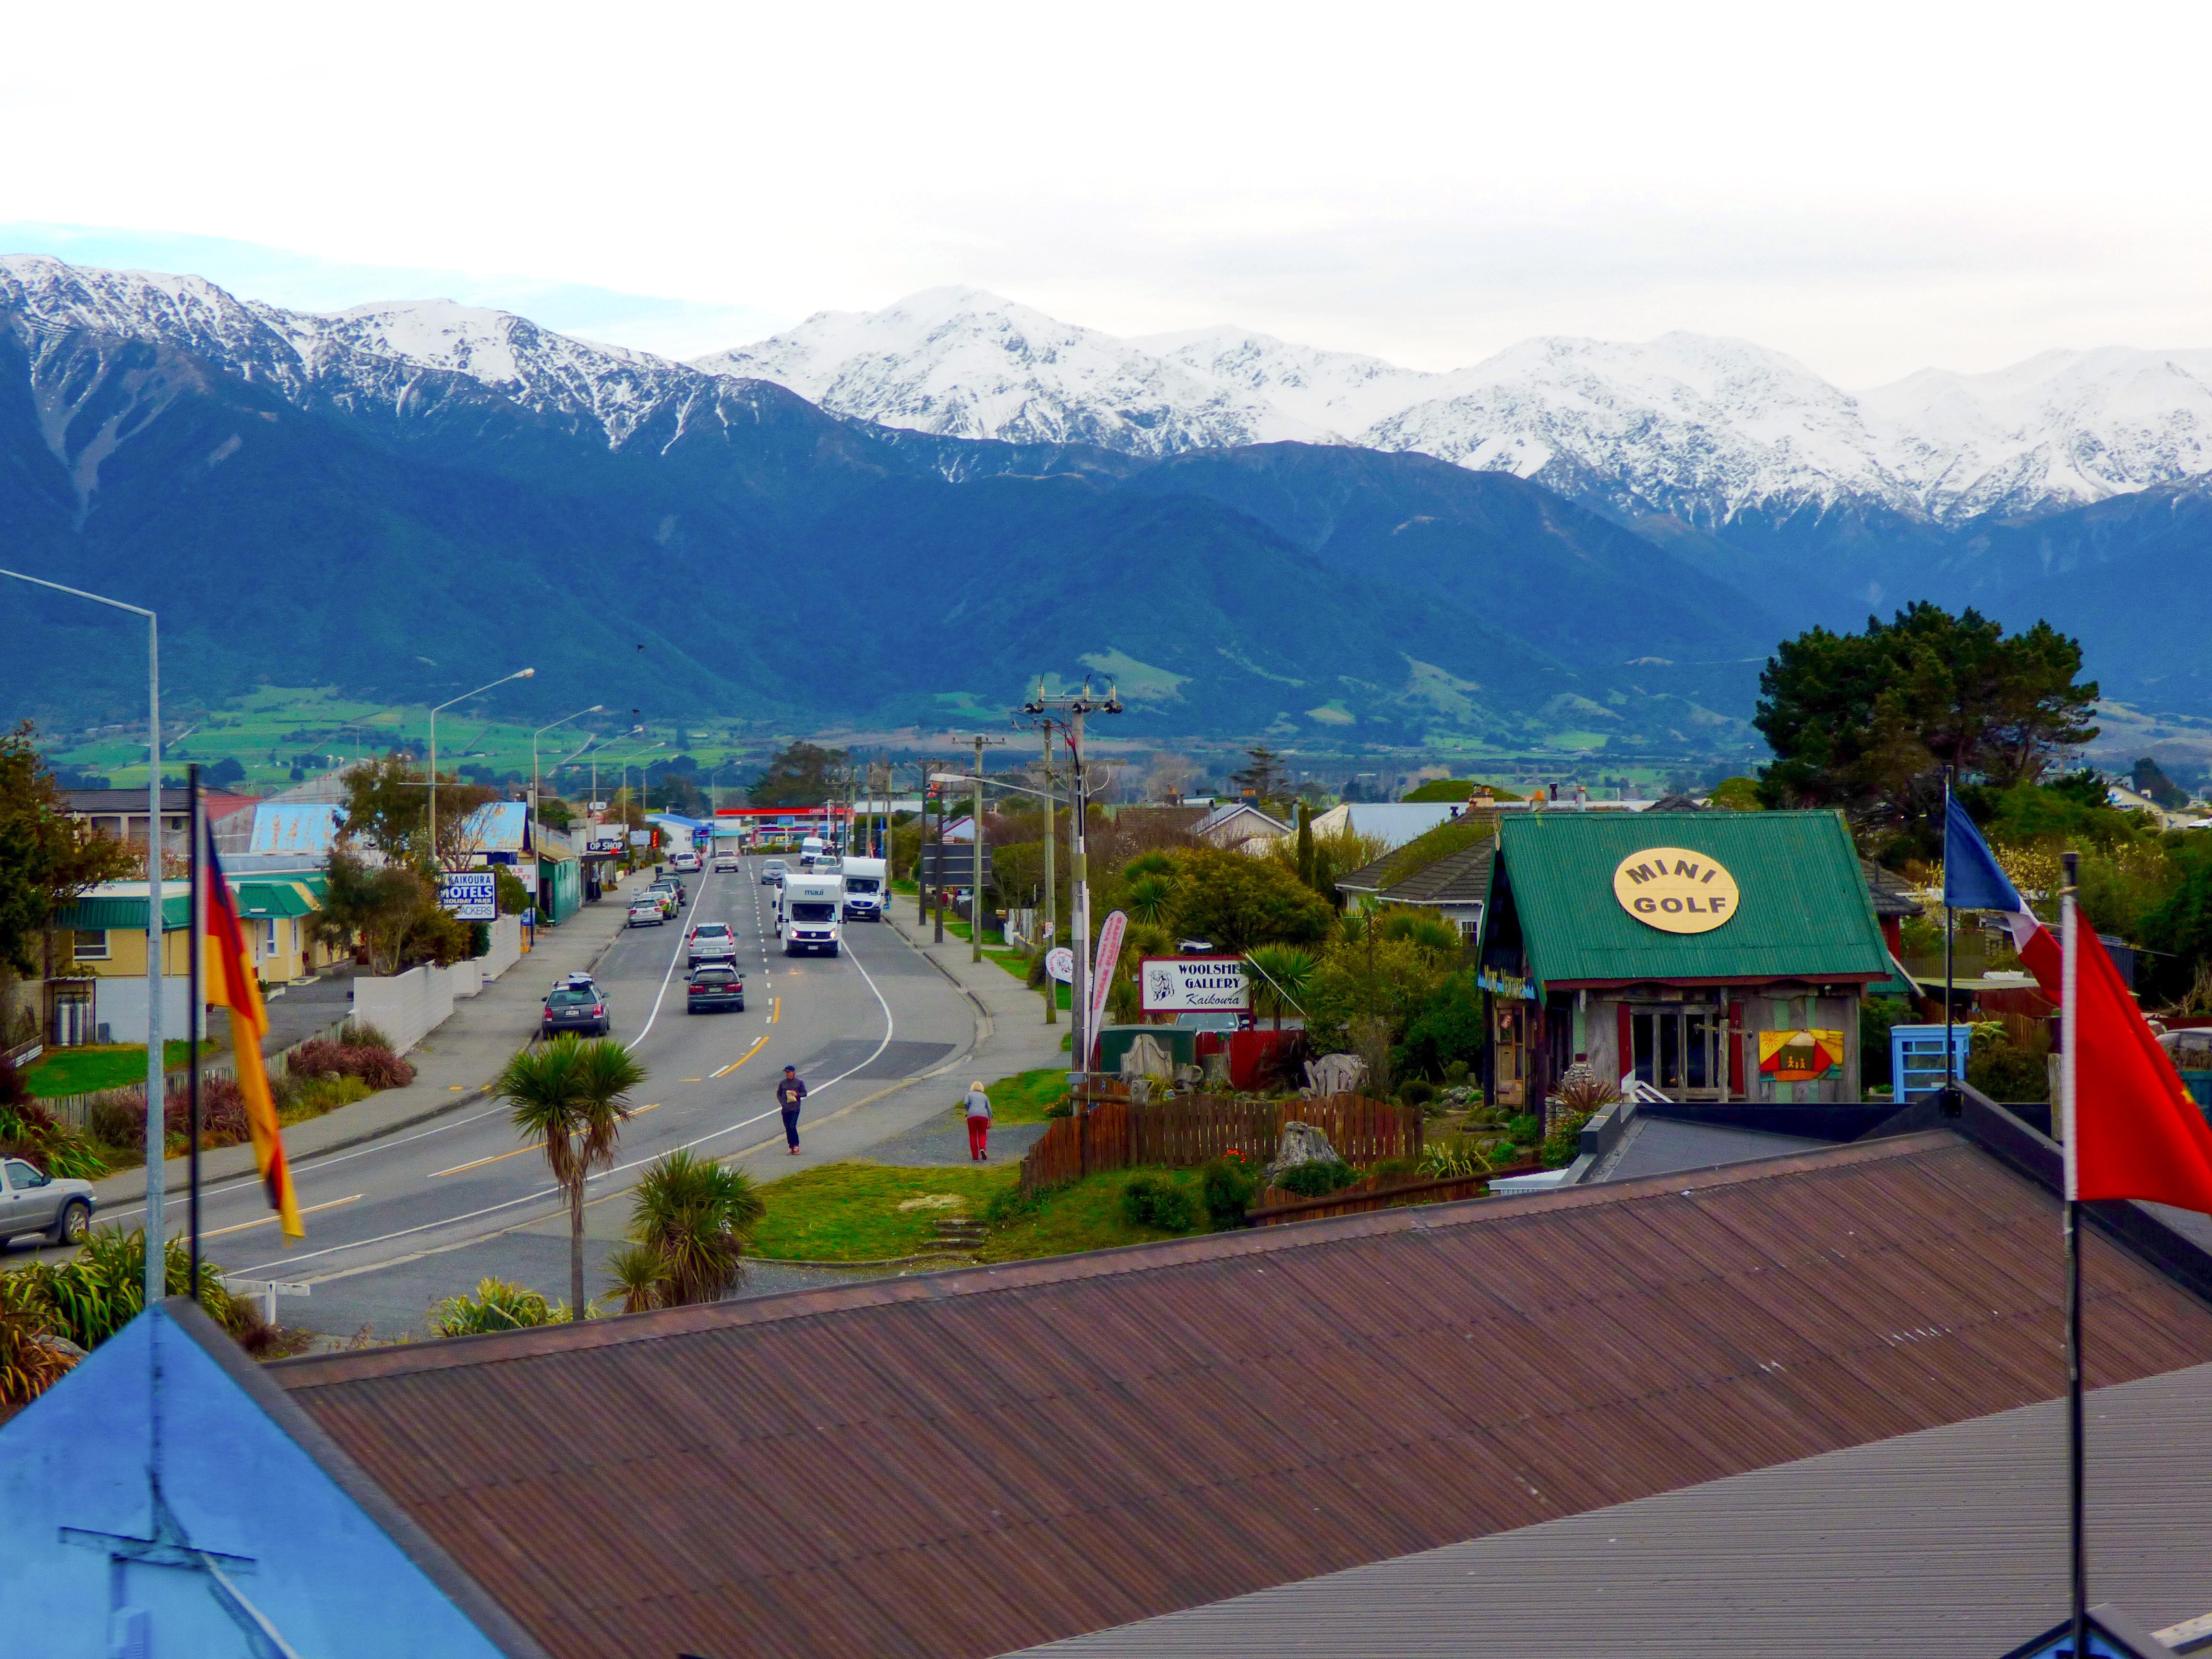 Kaikoura Ranges New Zealand, KiwiRail train journey, 7 day New Zealand tour